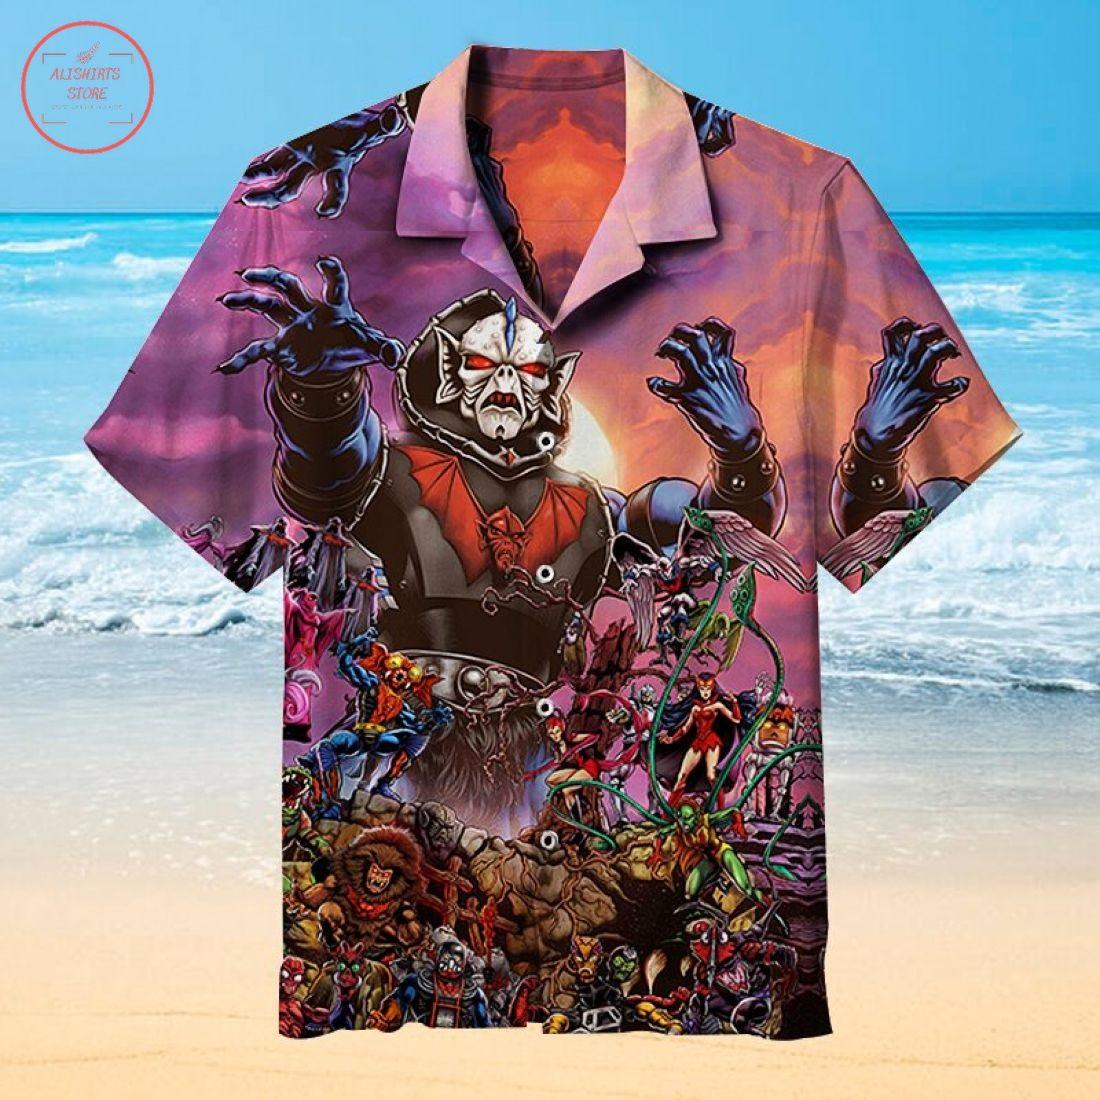 The Evil Horde Hawaiian shirt